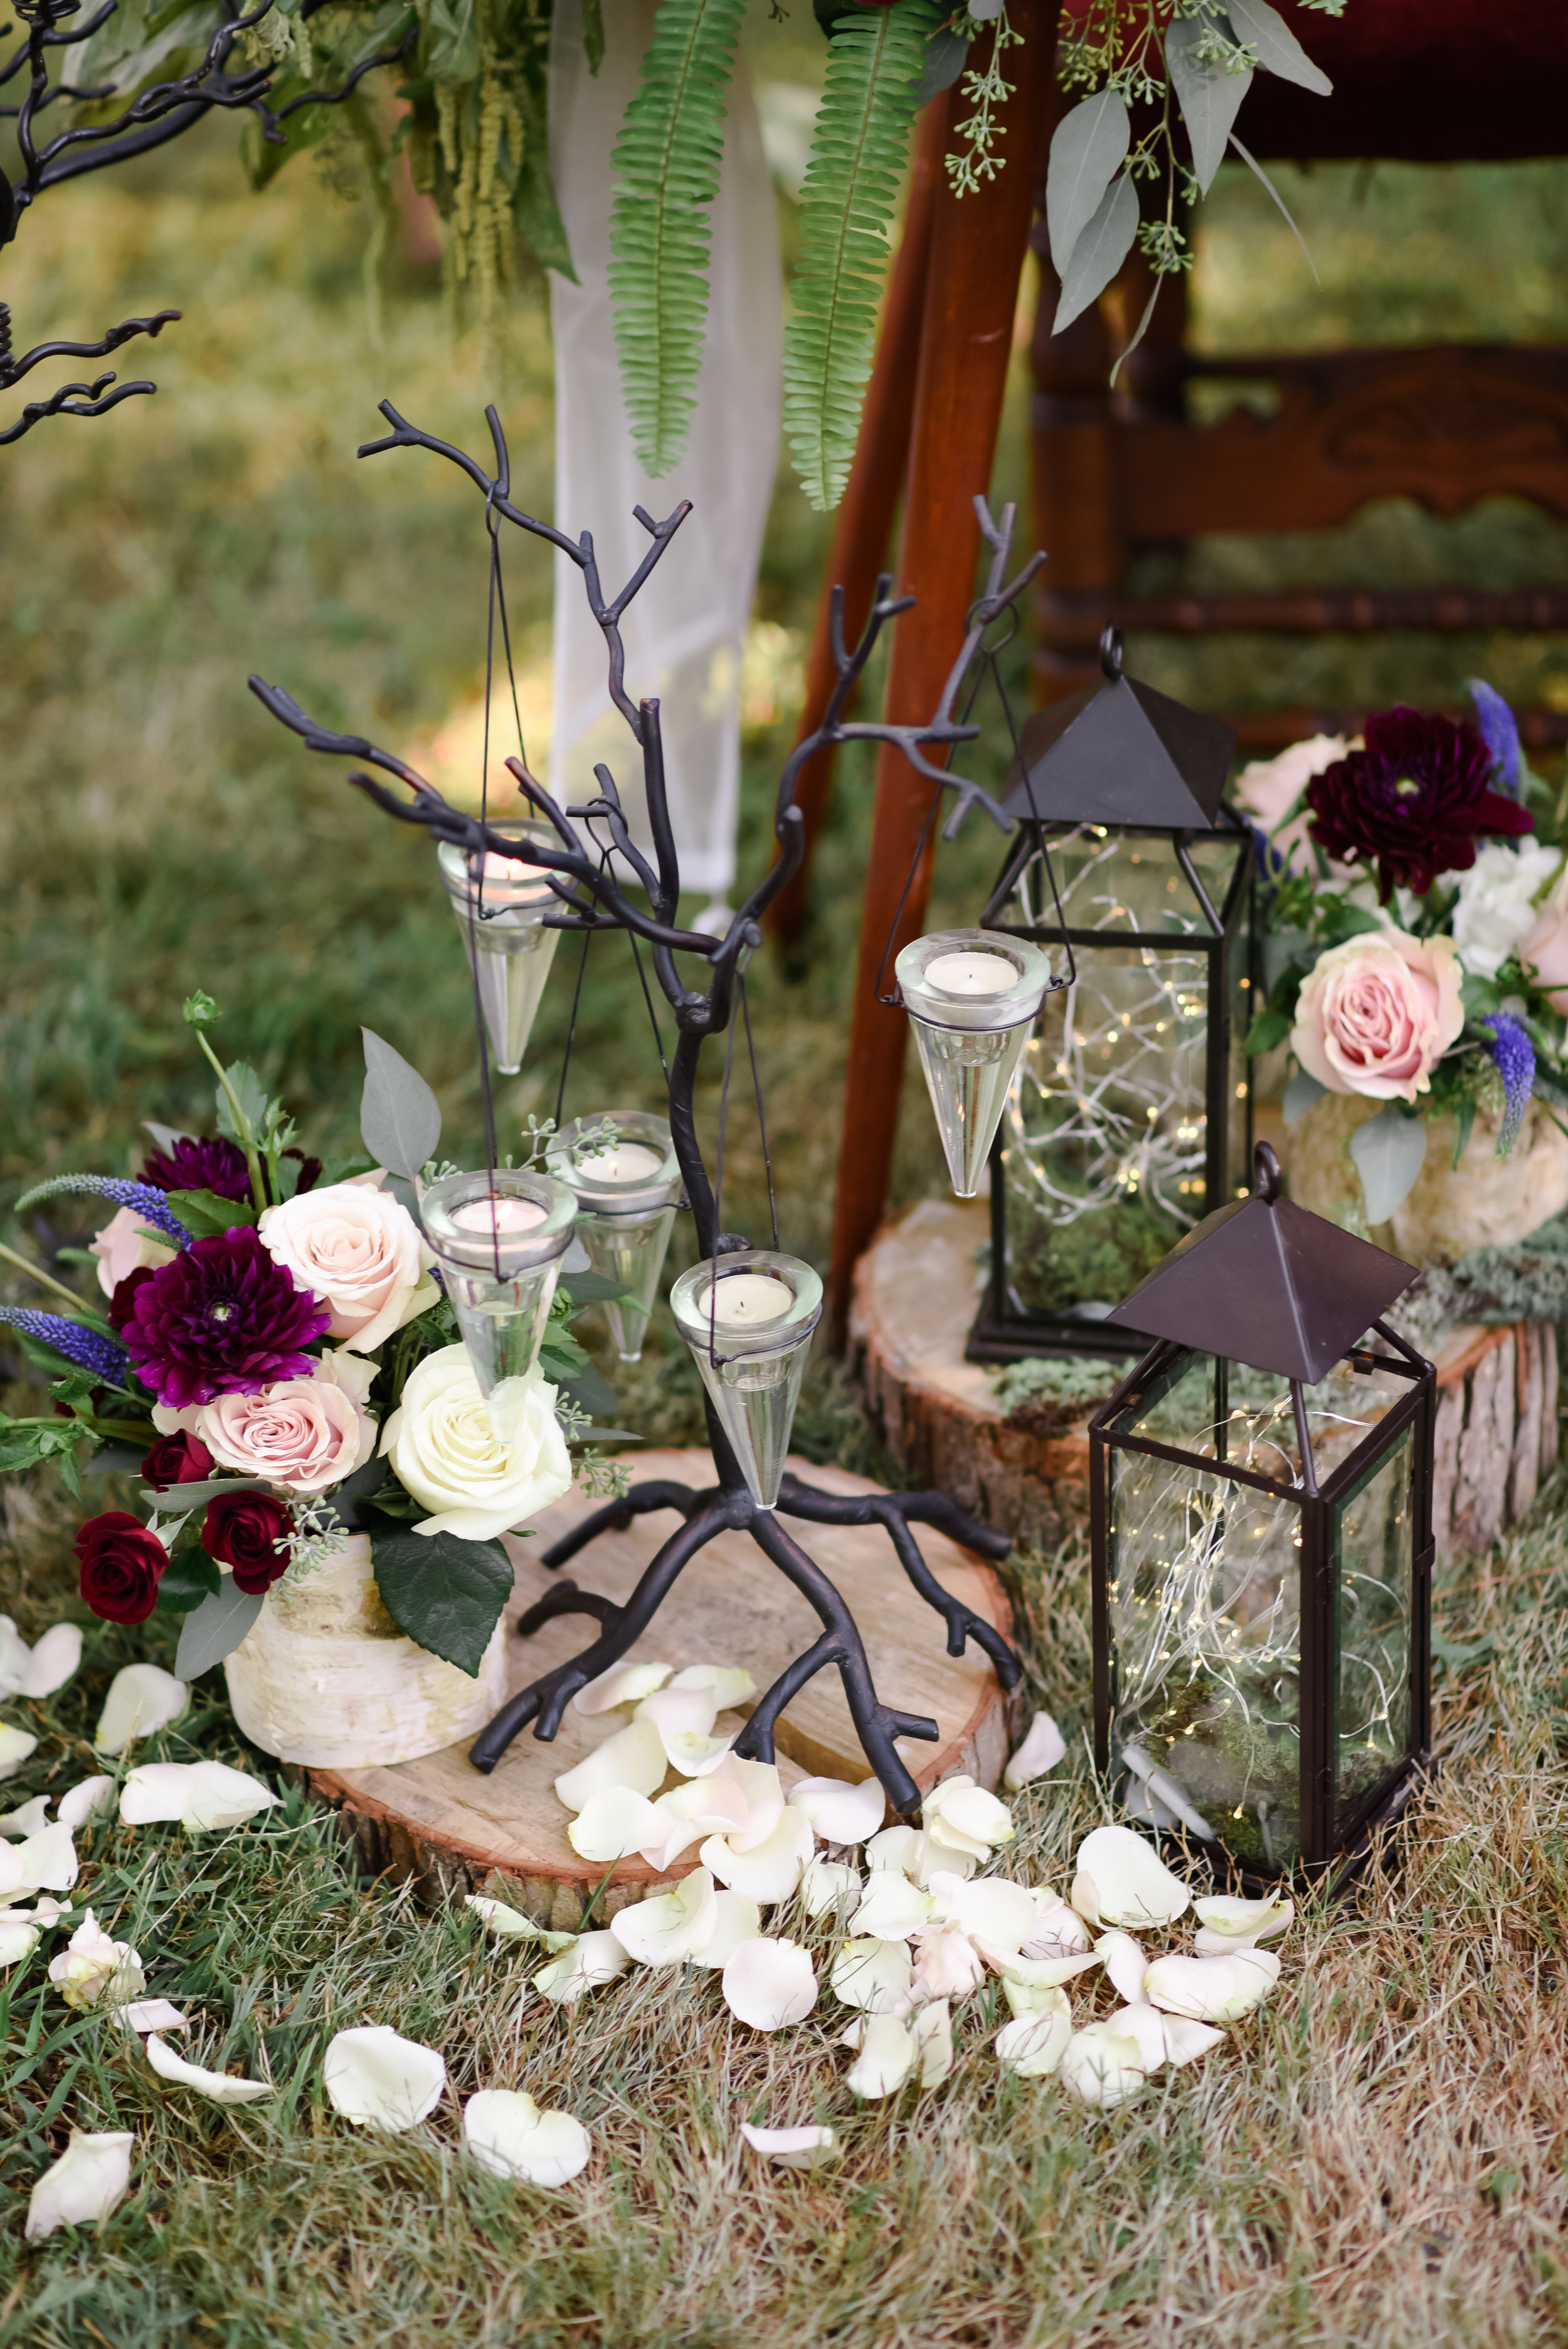 midsummers-eve-wedding-floral-blush-dress-david-tutera-cary-hill-plantation-photo-virginia-bride-121.jpg